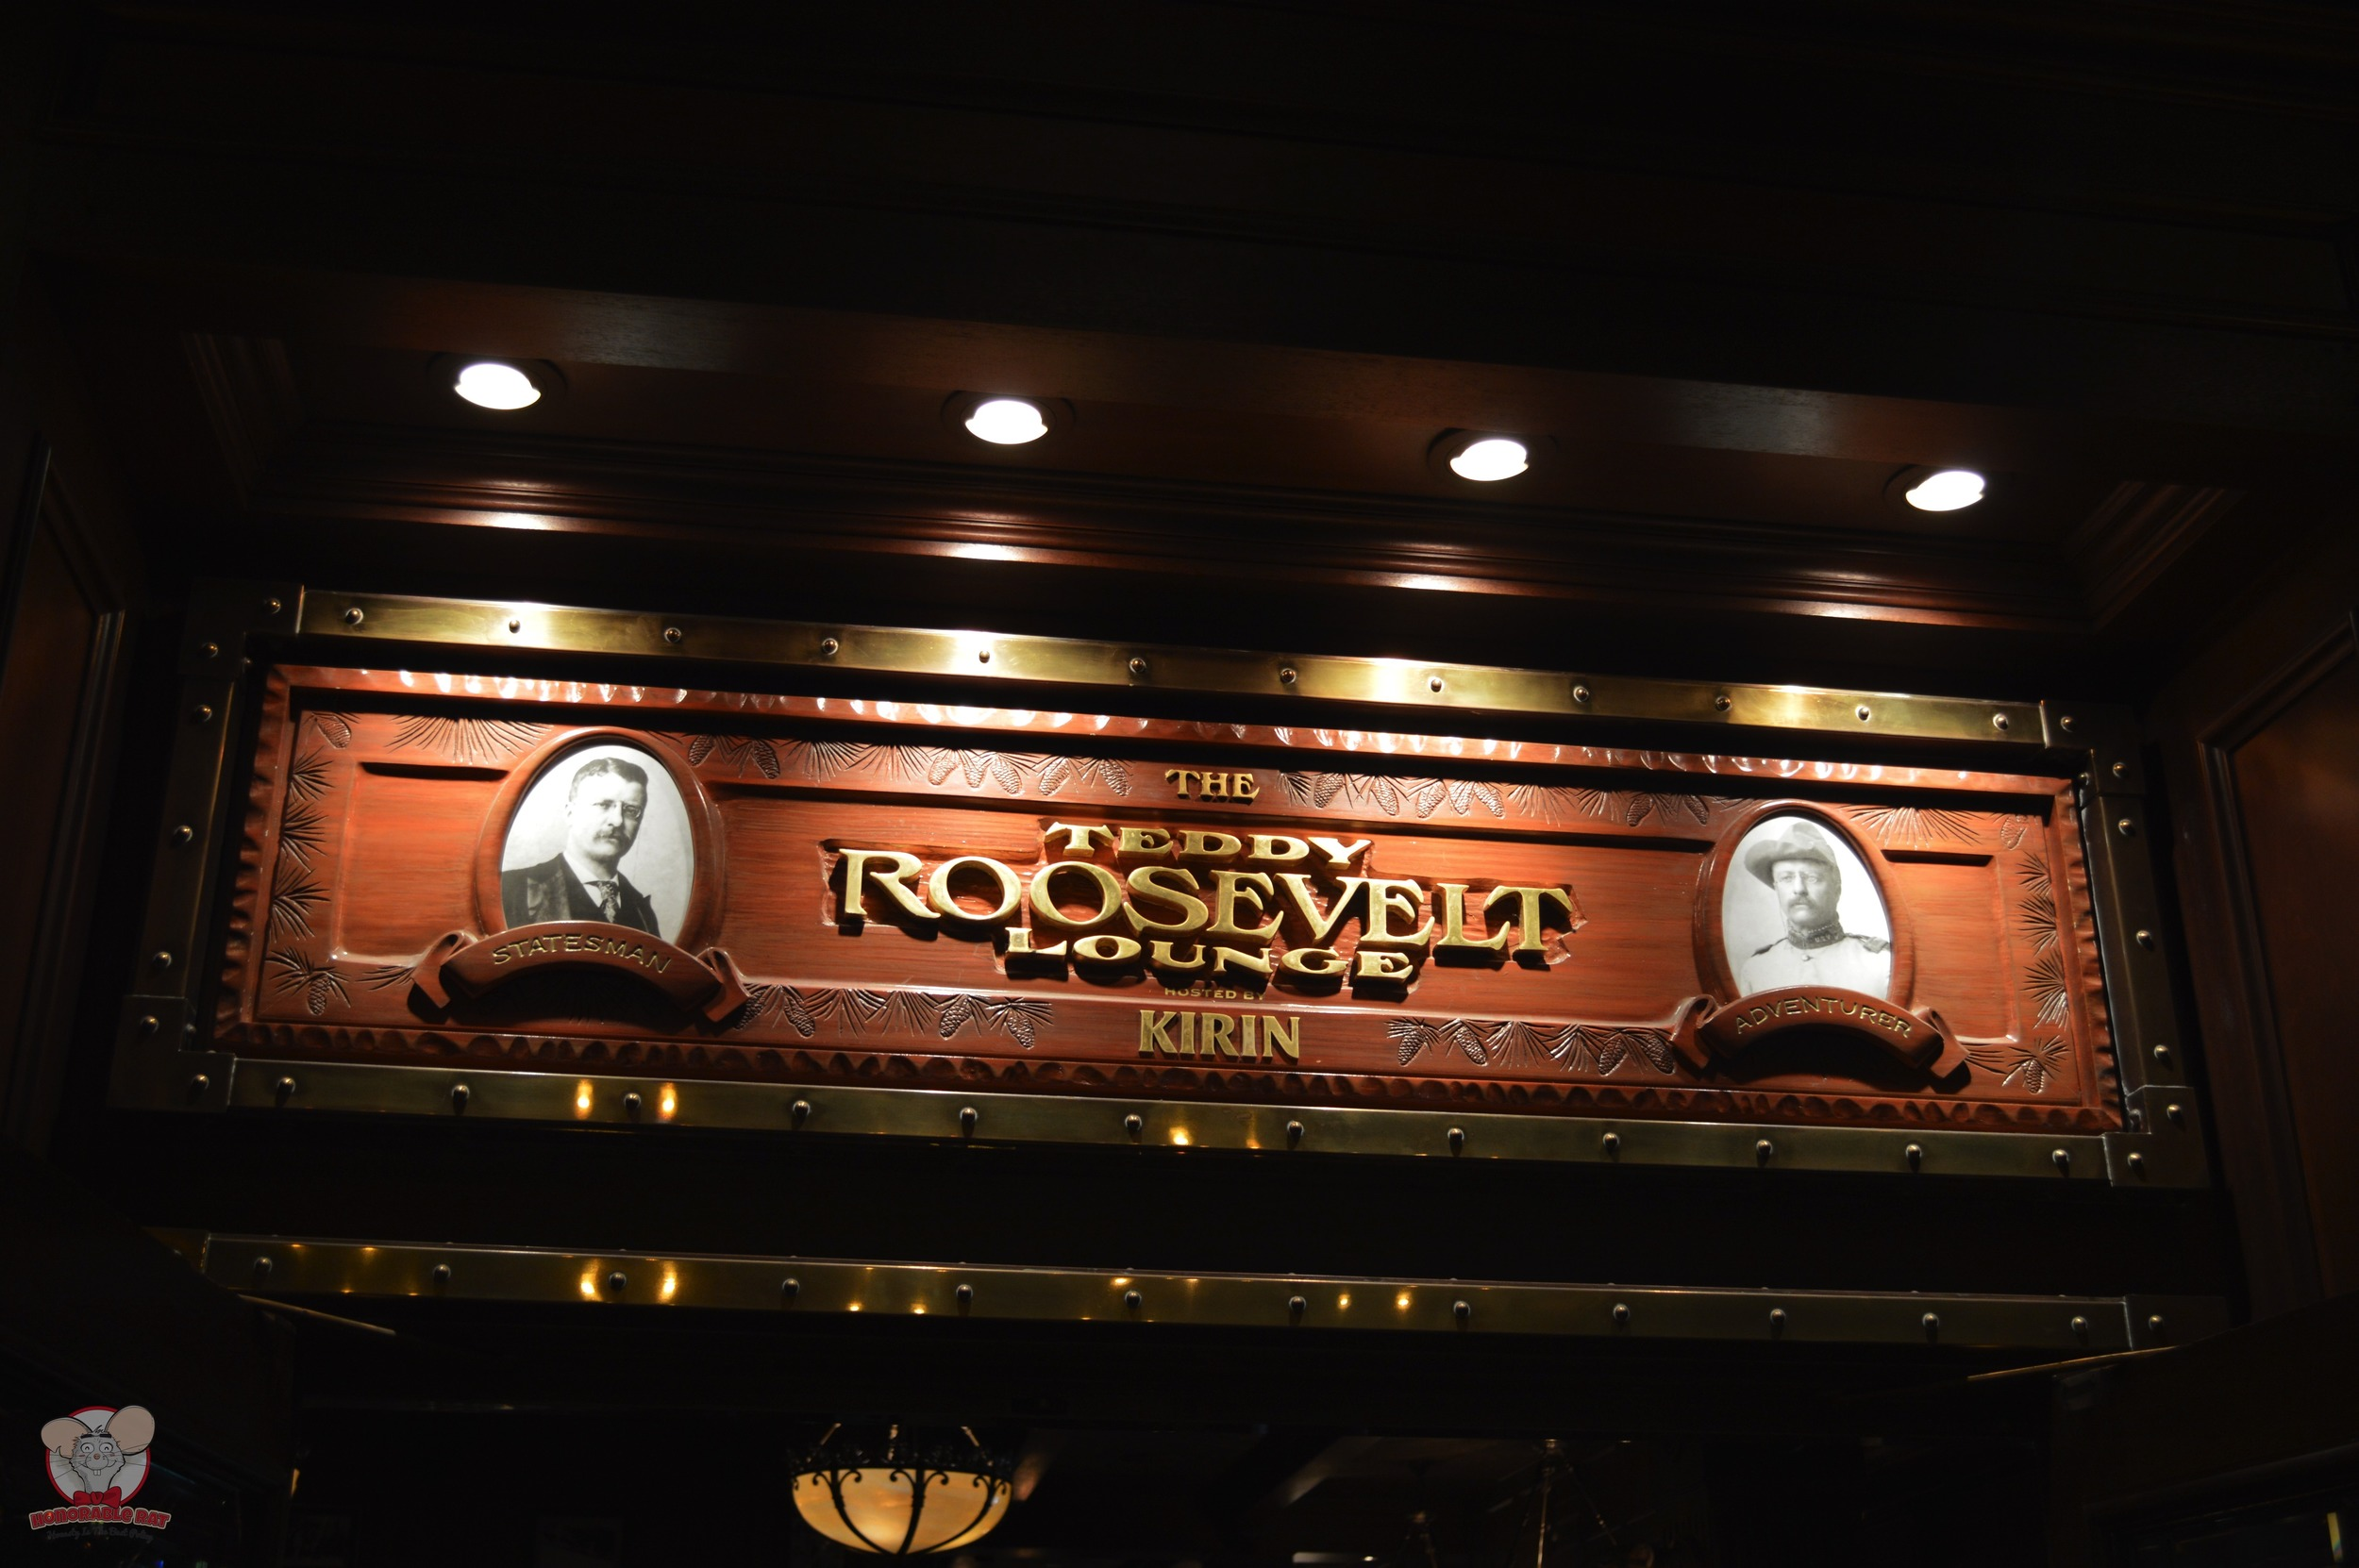 Teddy Roosevelt Lounge